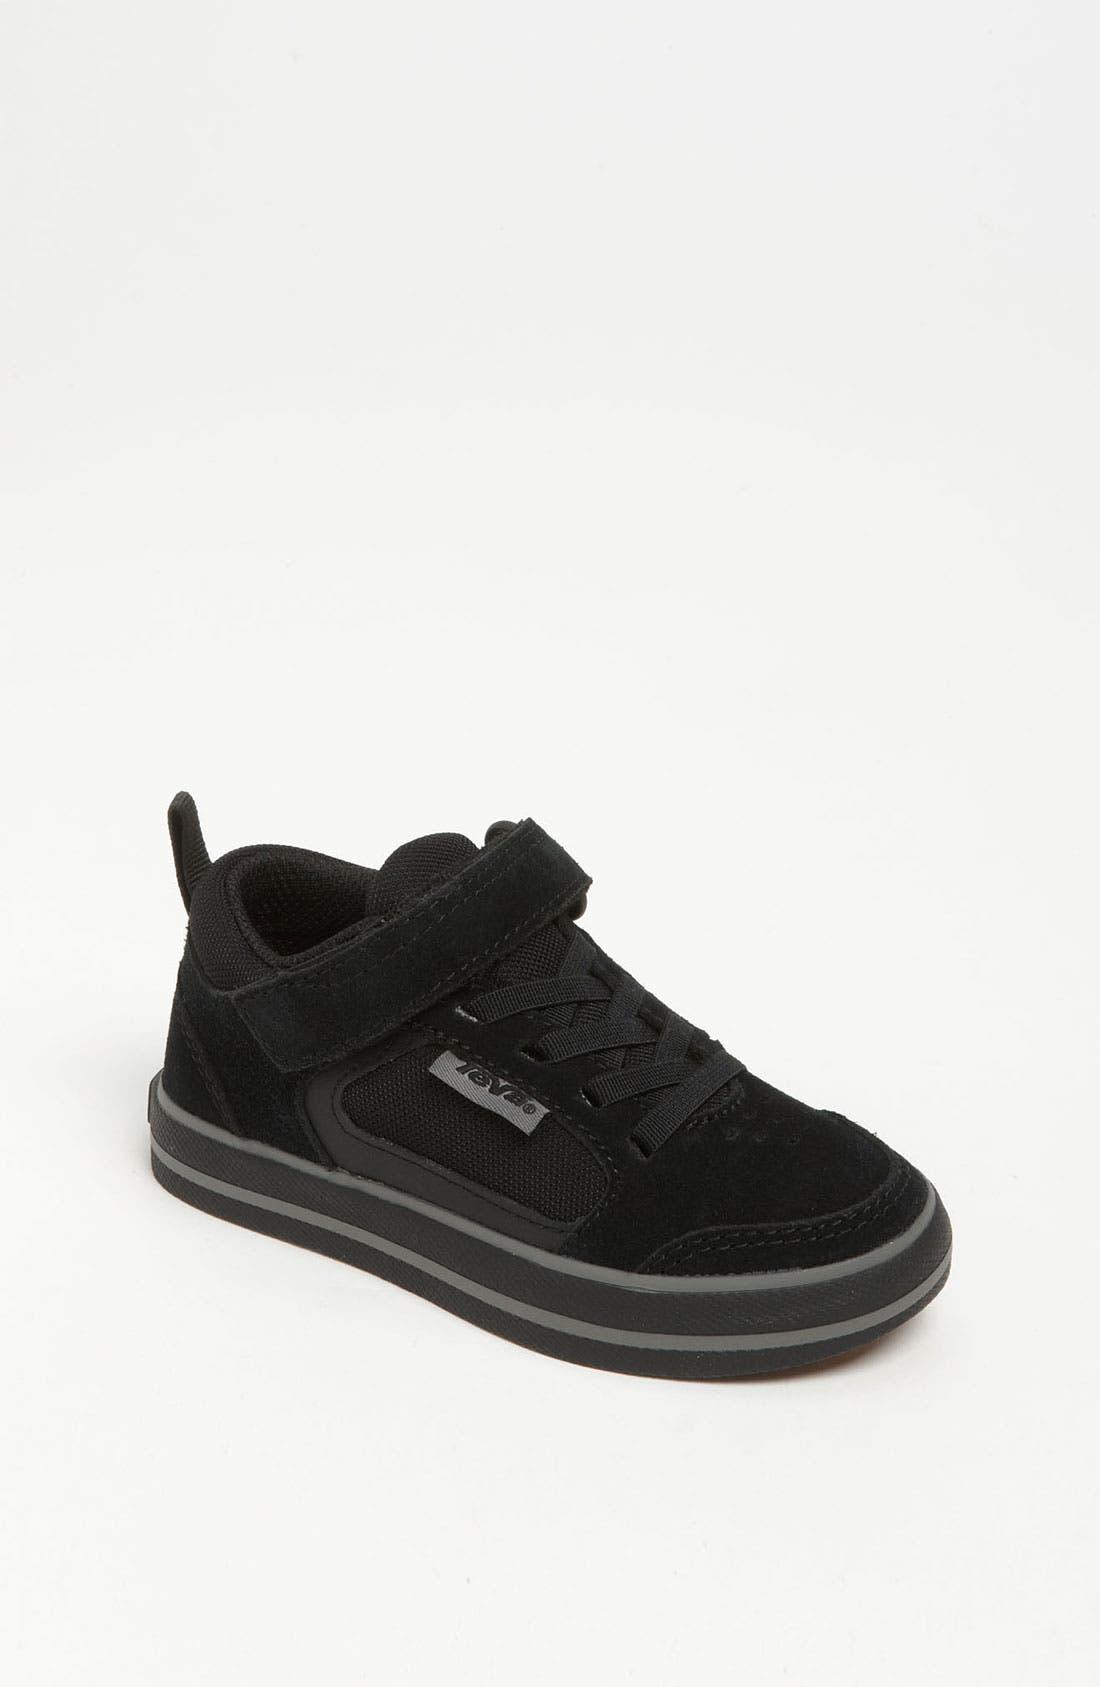 Main Image - Teva 'Crank C' Sneaker (Toddler & Little Kid)